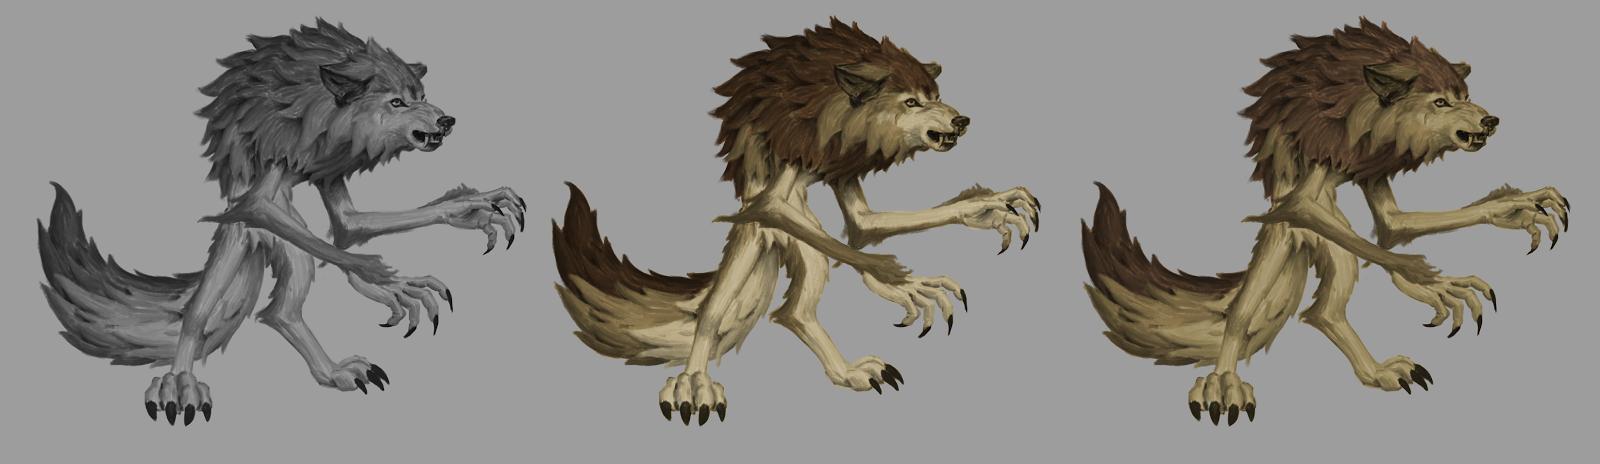 [Image: 2017_05_19_werewolf.PNG]